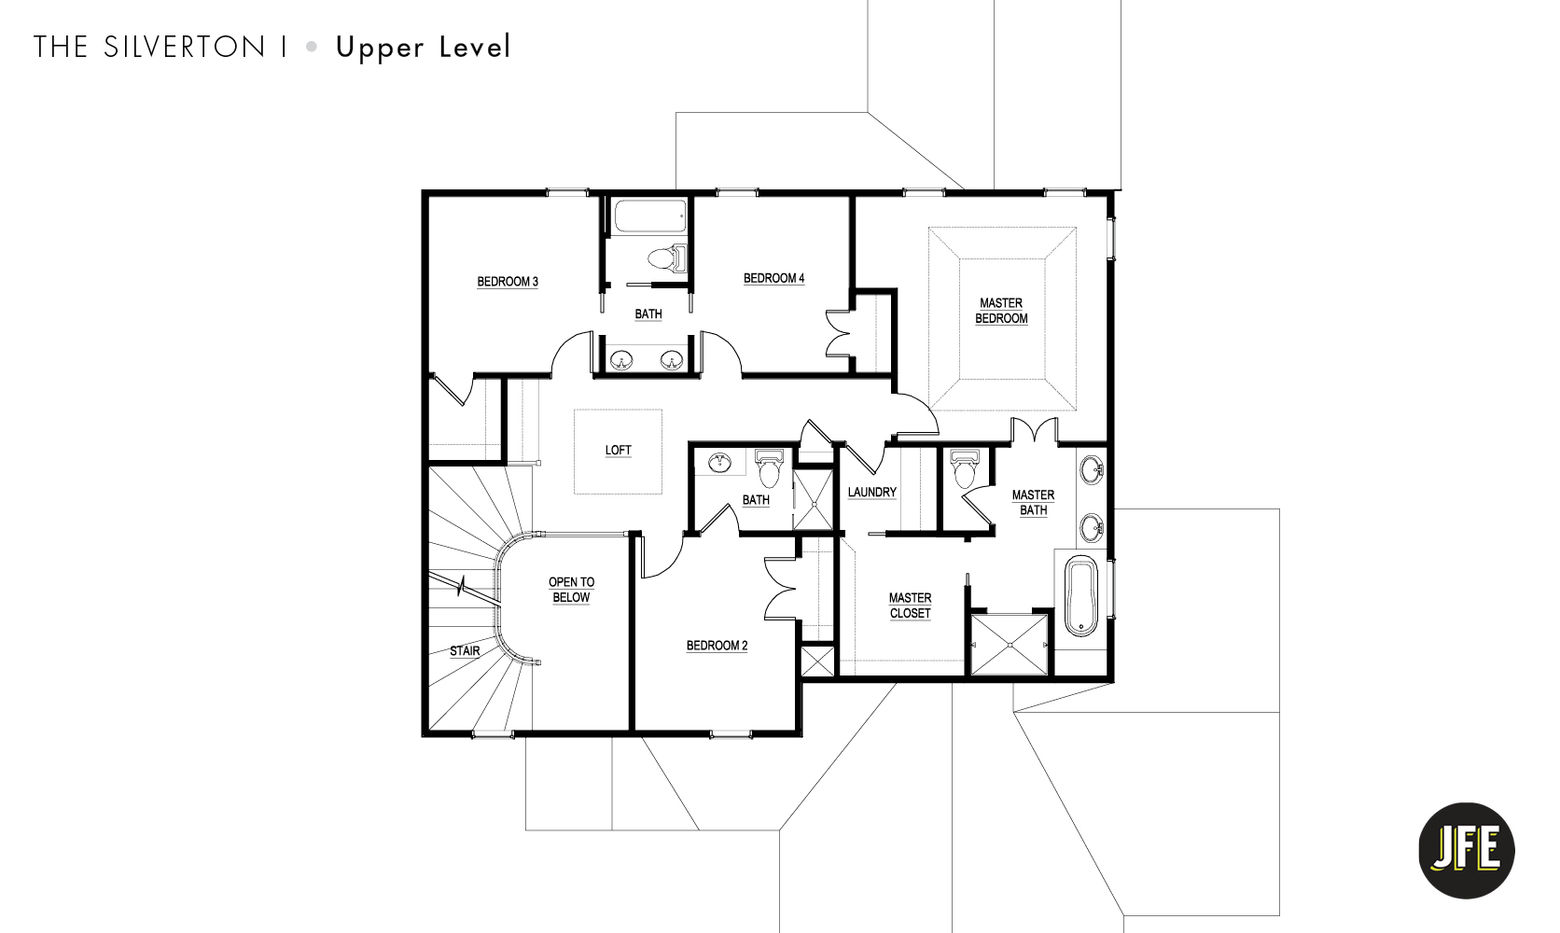 The-Silverton-I-Upper-Level-2.jpg